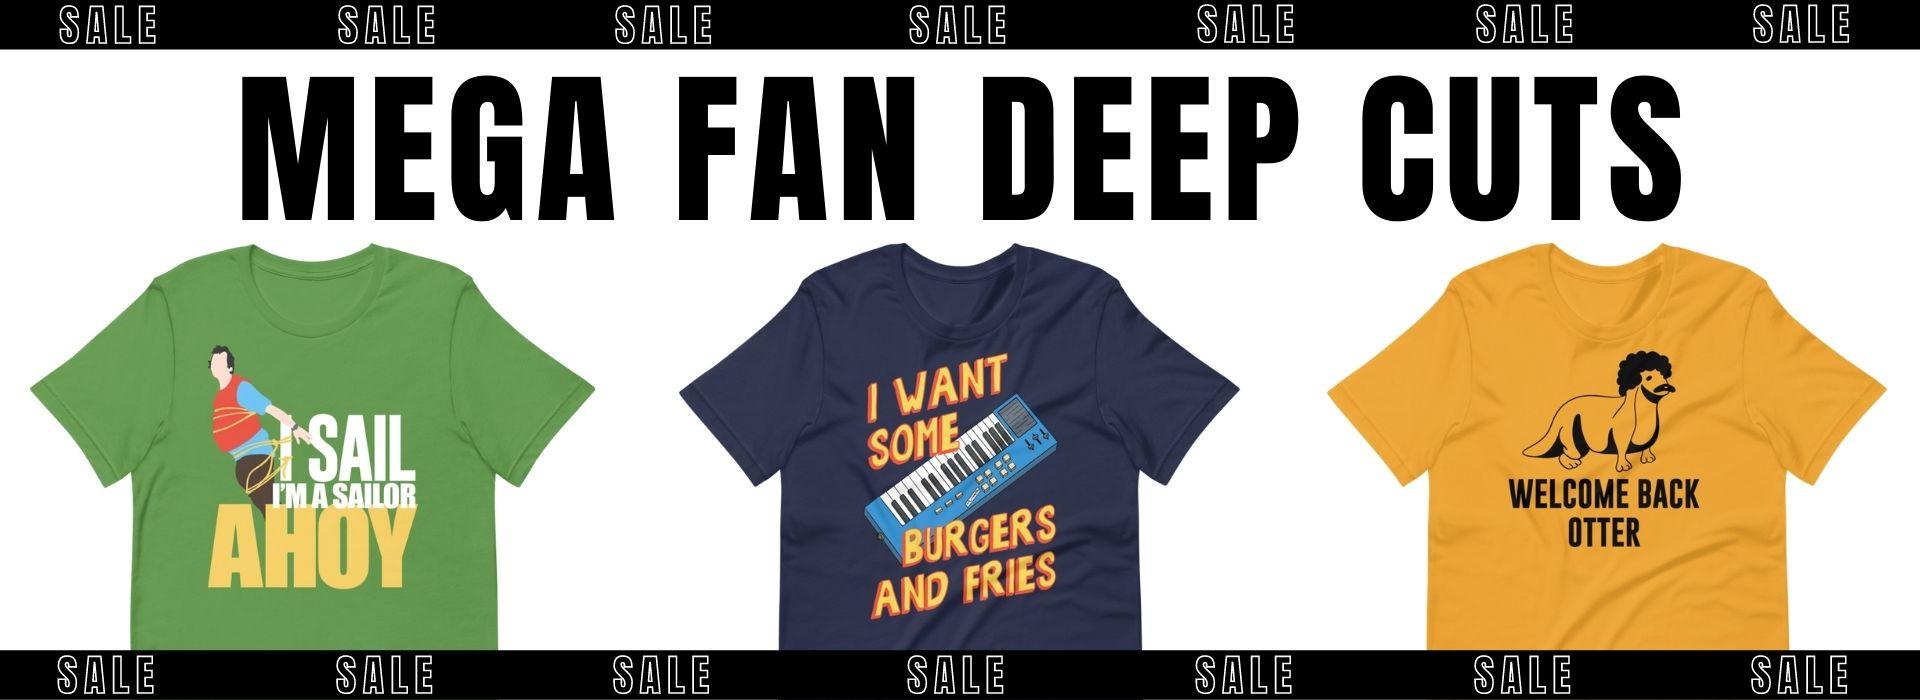 CultSub T-Shirts Movies TV Music Fan T-Shirt Sale Handmade Designs